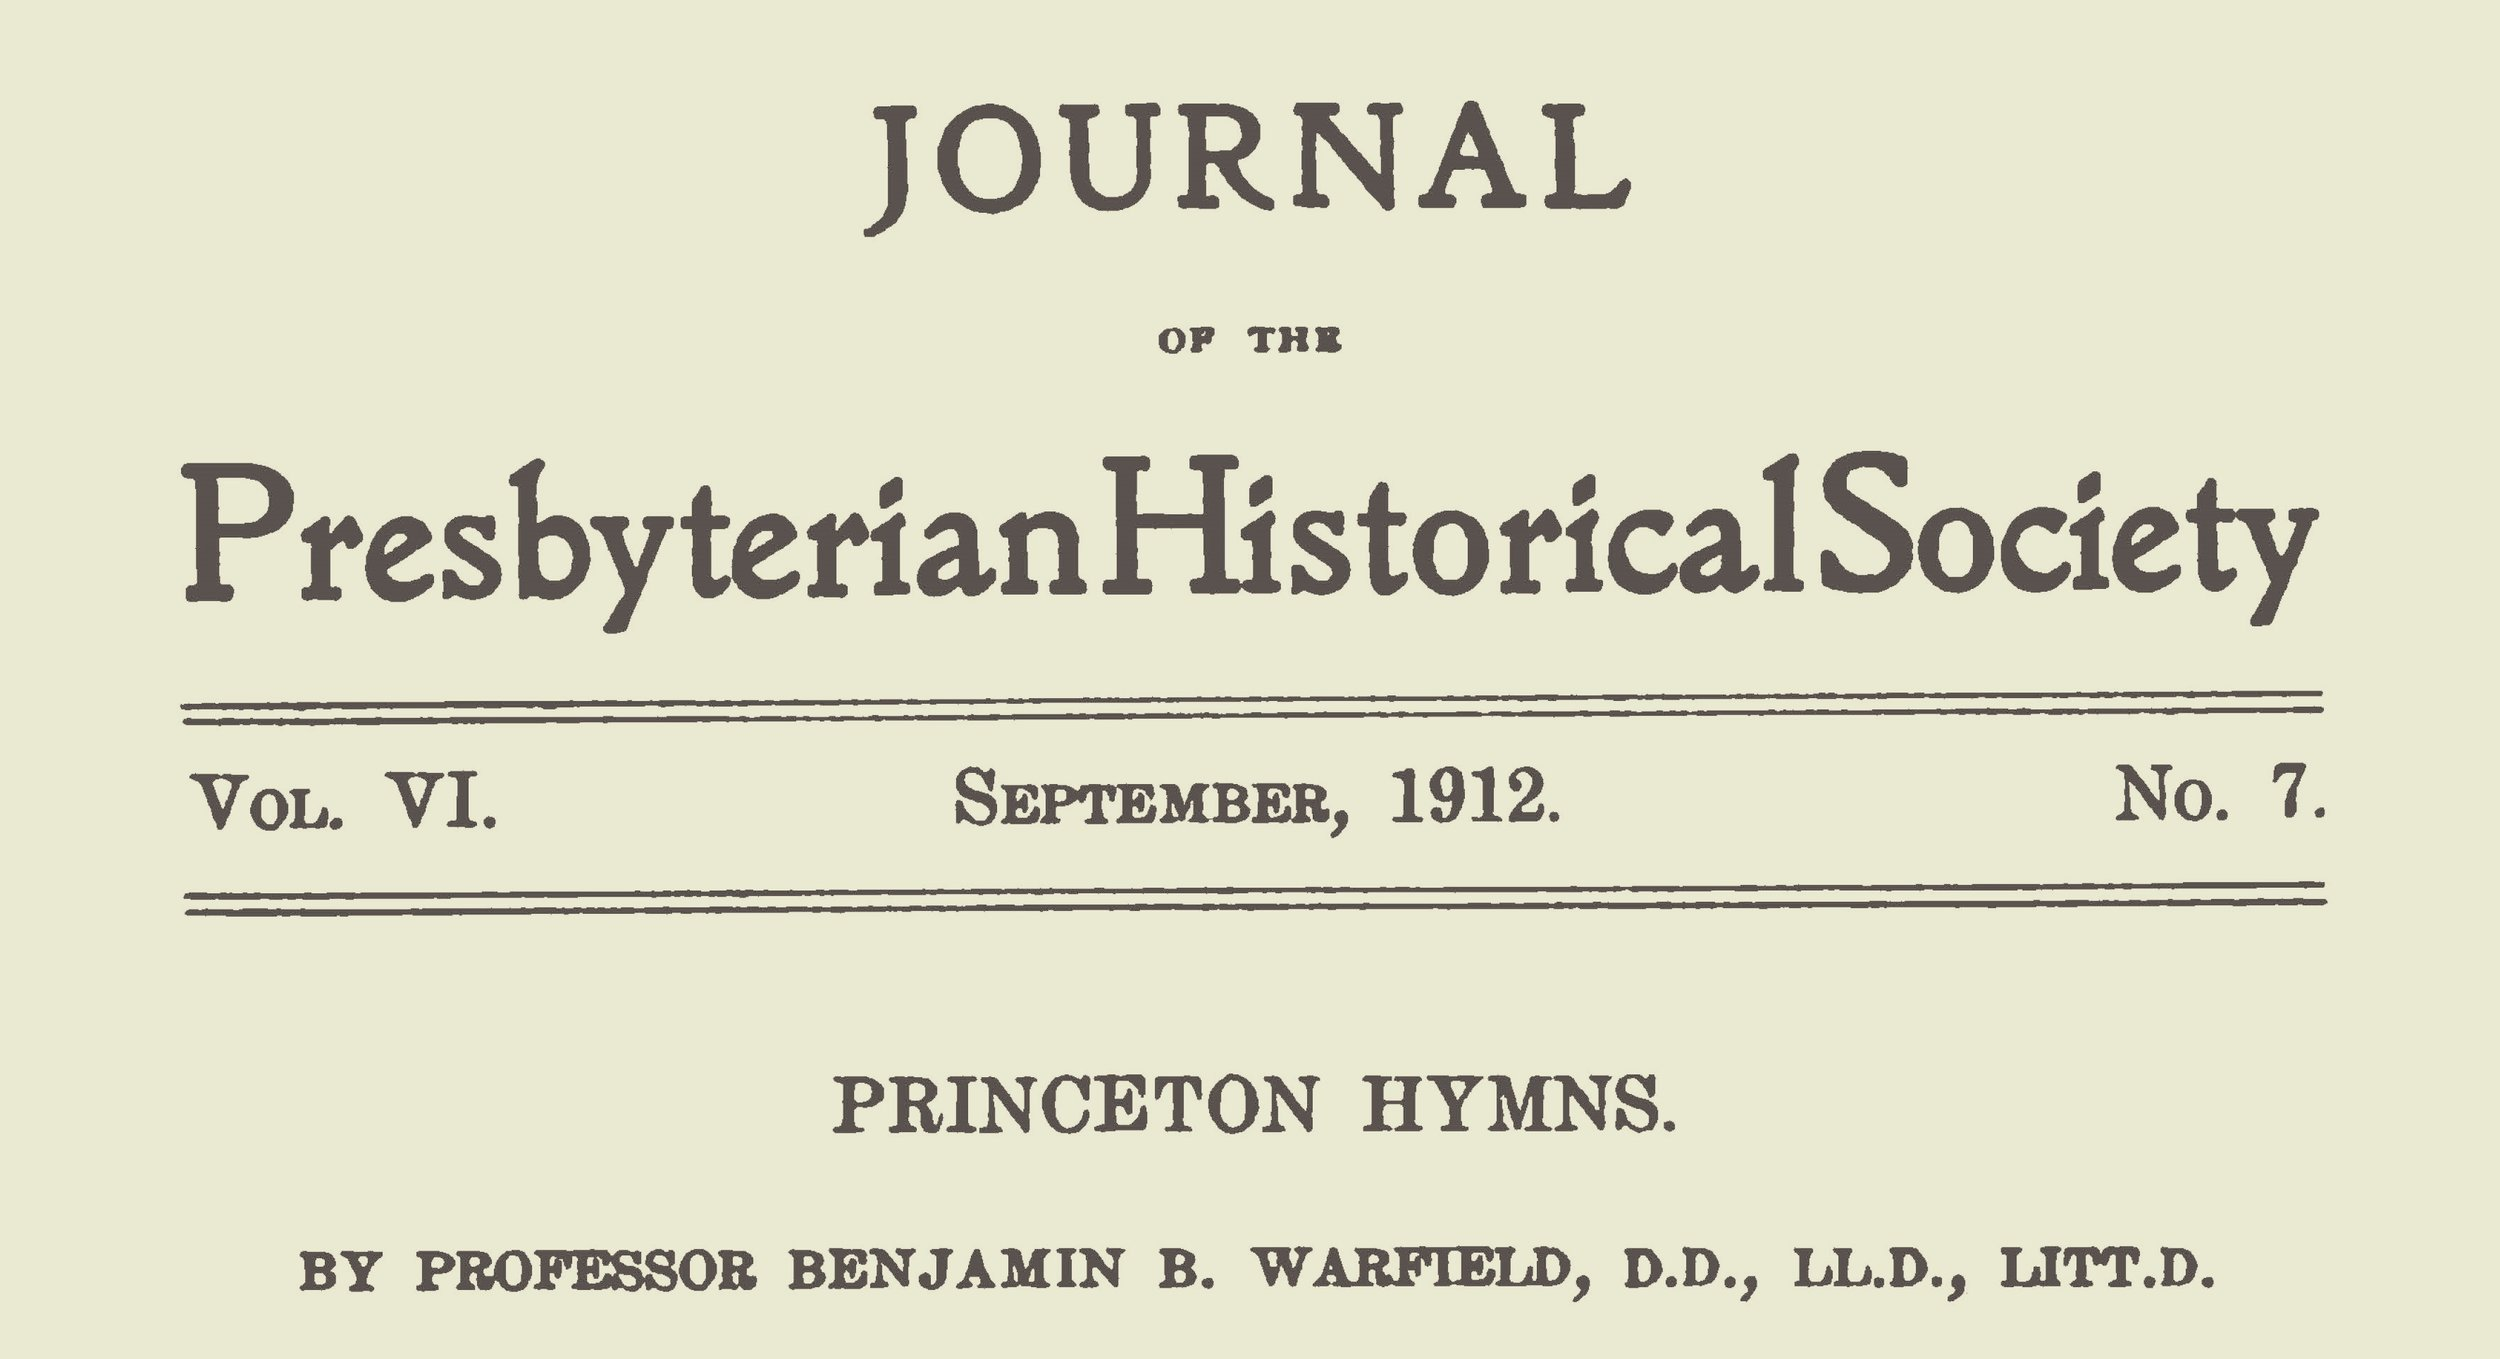 Warfield, Benjamin Breckinridge, Princeton Hymns Title Page.jpg